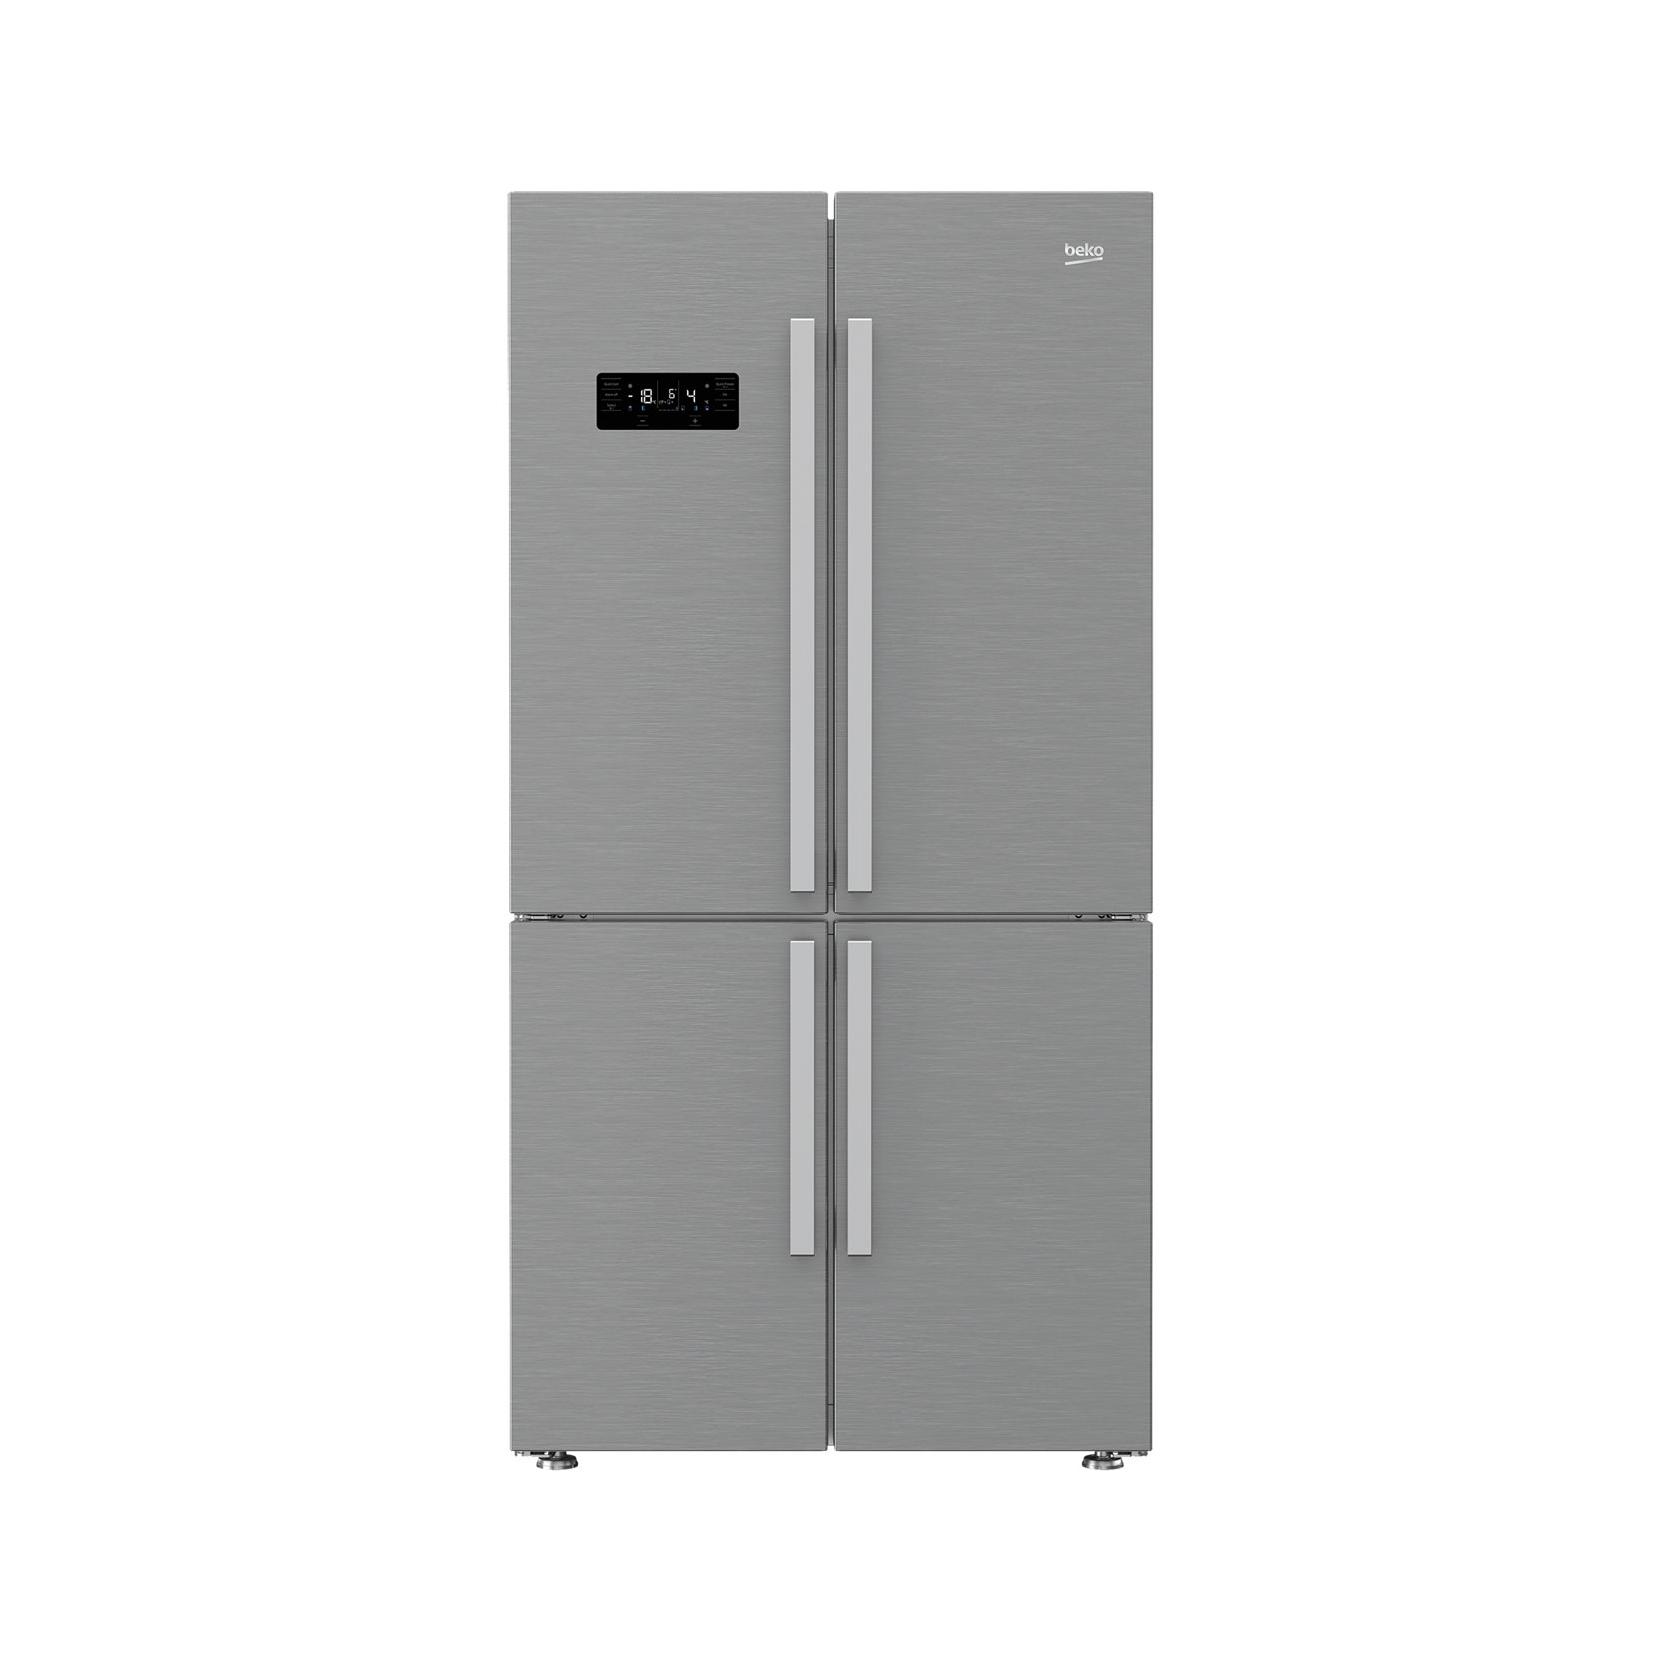 Beko gn1416221zx frigorifero 4 porte no frost 626 litri for Frigorifero beko no frost